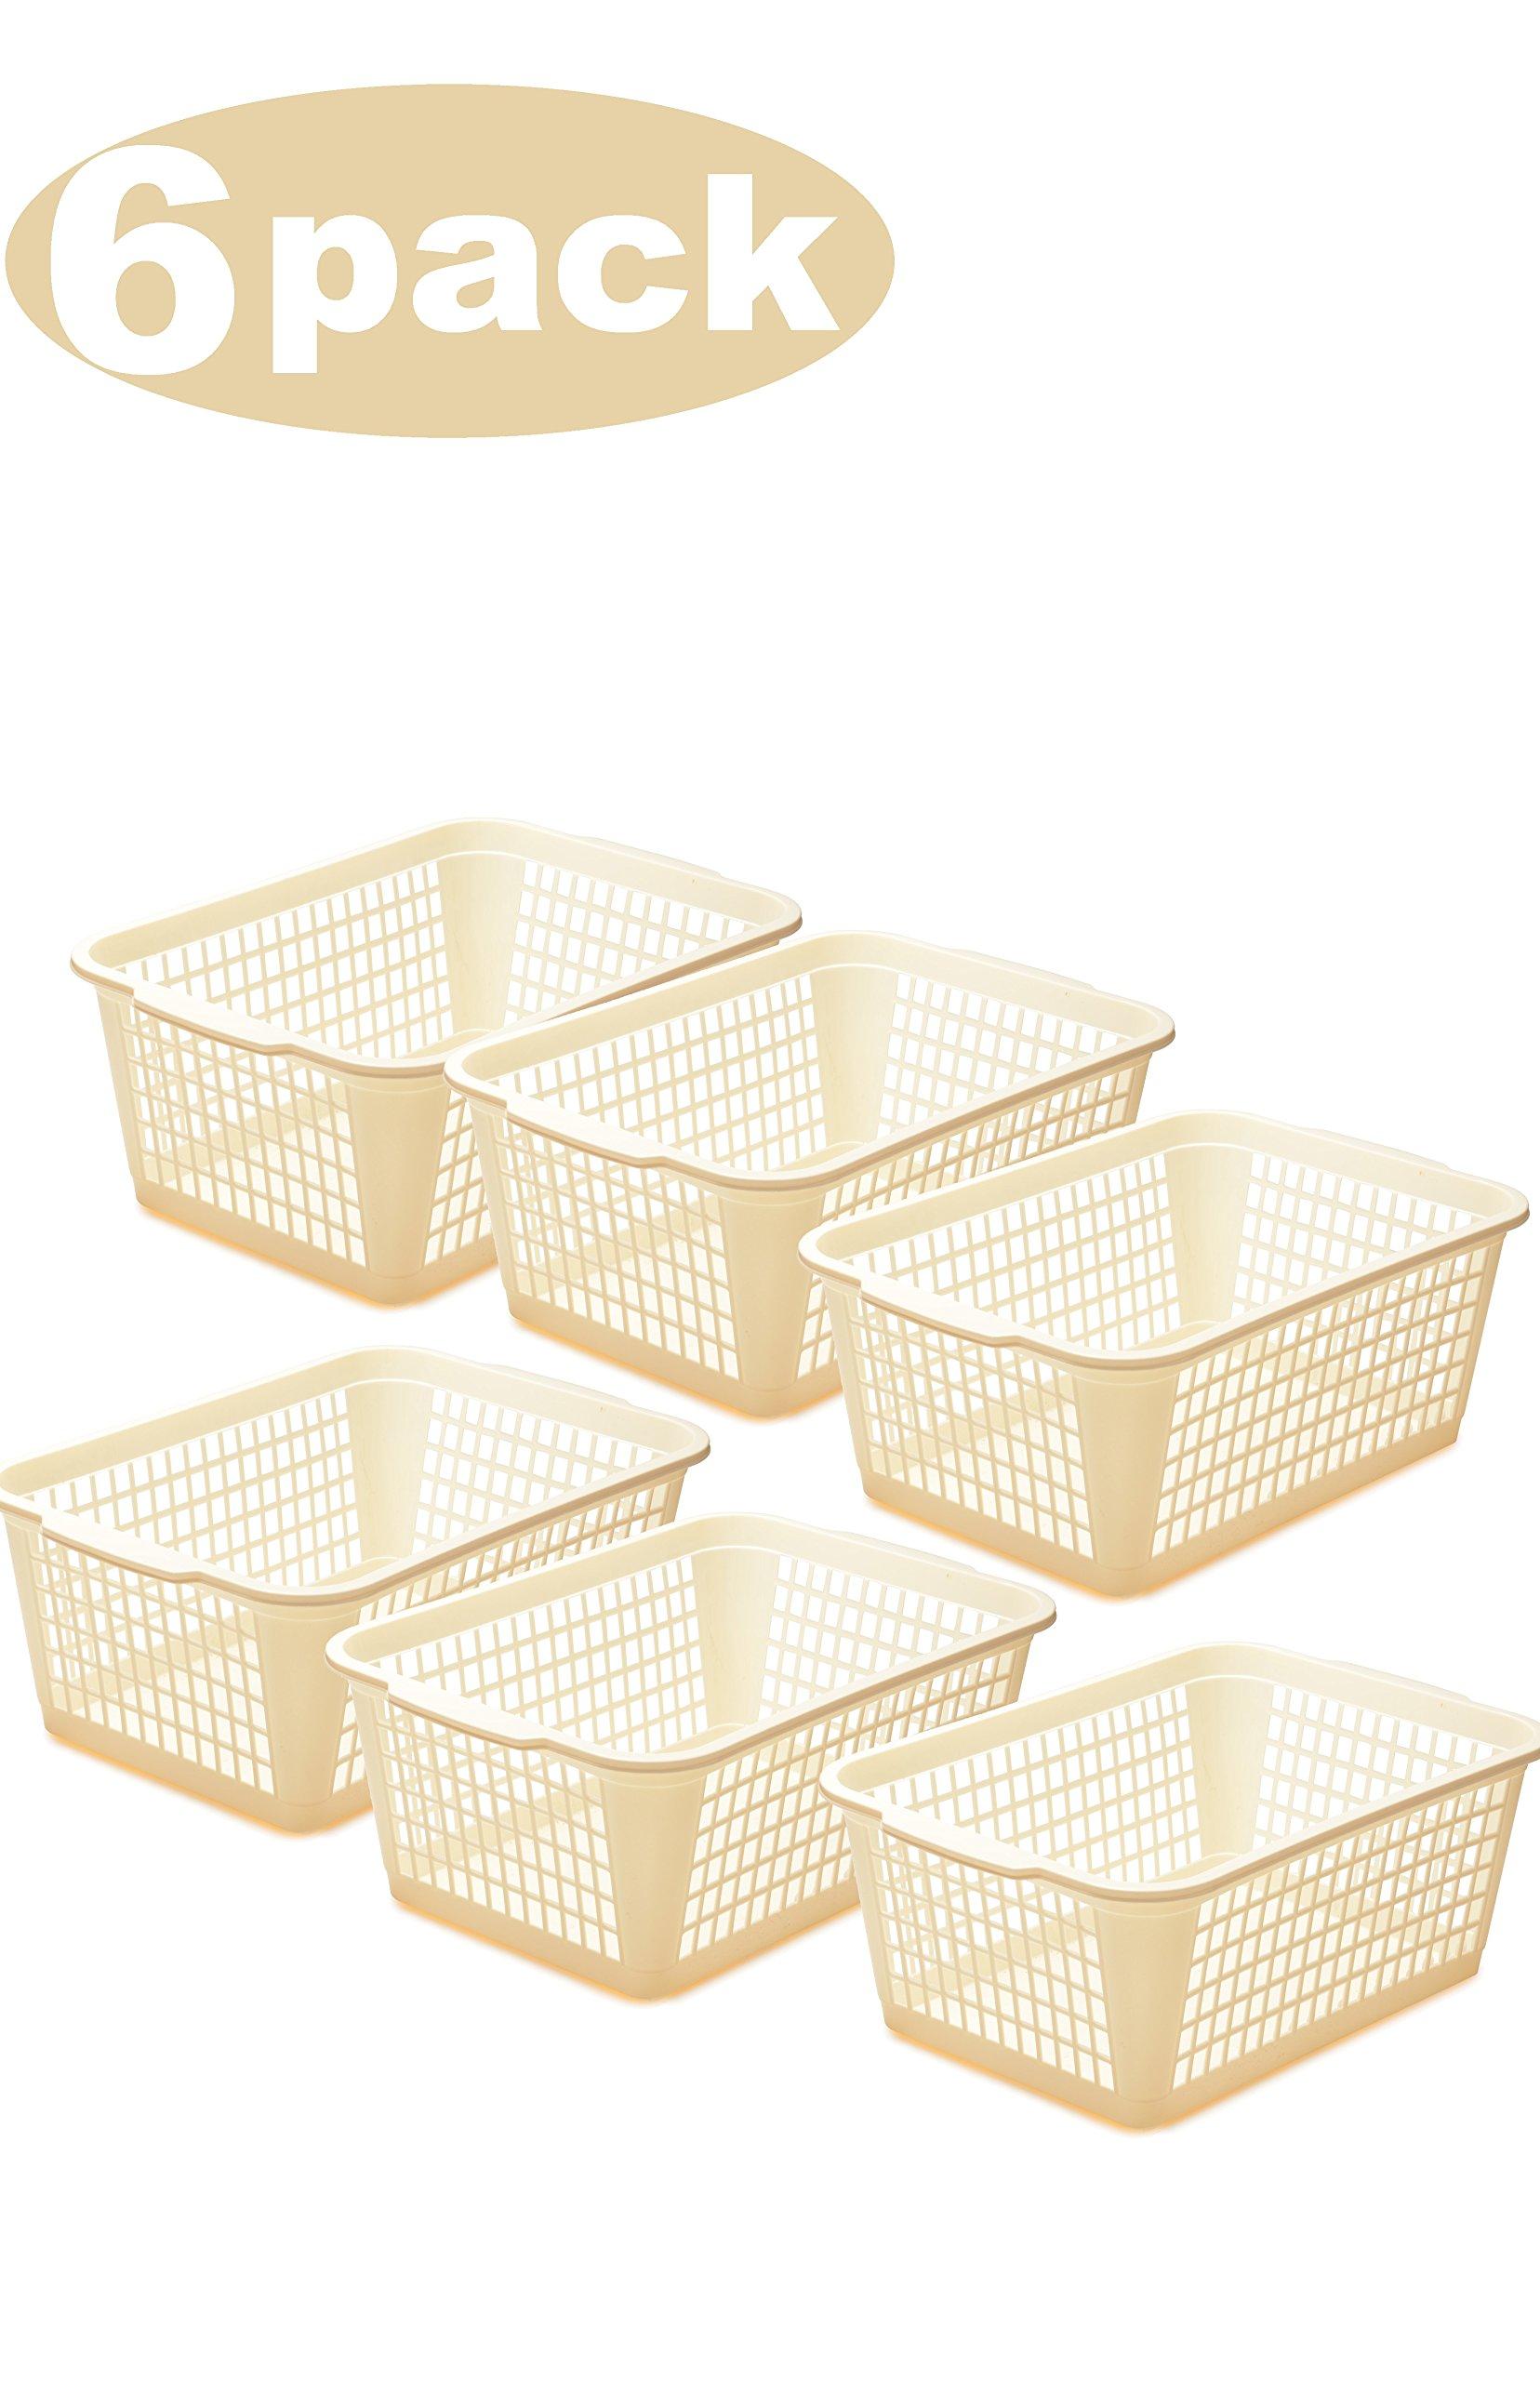 Ybmhome YBM HOME Plastic Perforated Storage Basket Bin Office Drawer, Shelf Desktop Countertop Tray Organizer 32-1184 (6, Ivory)